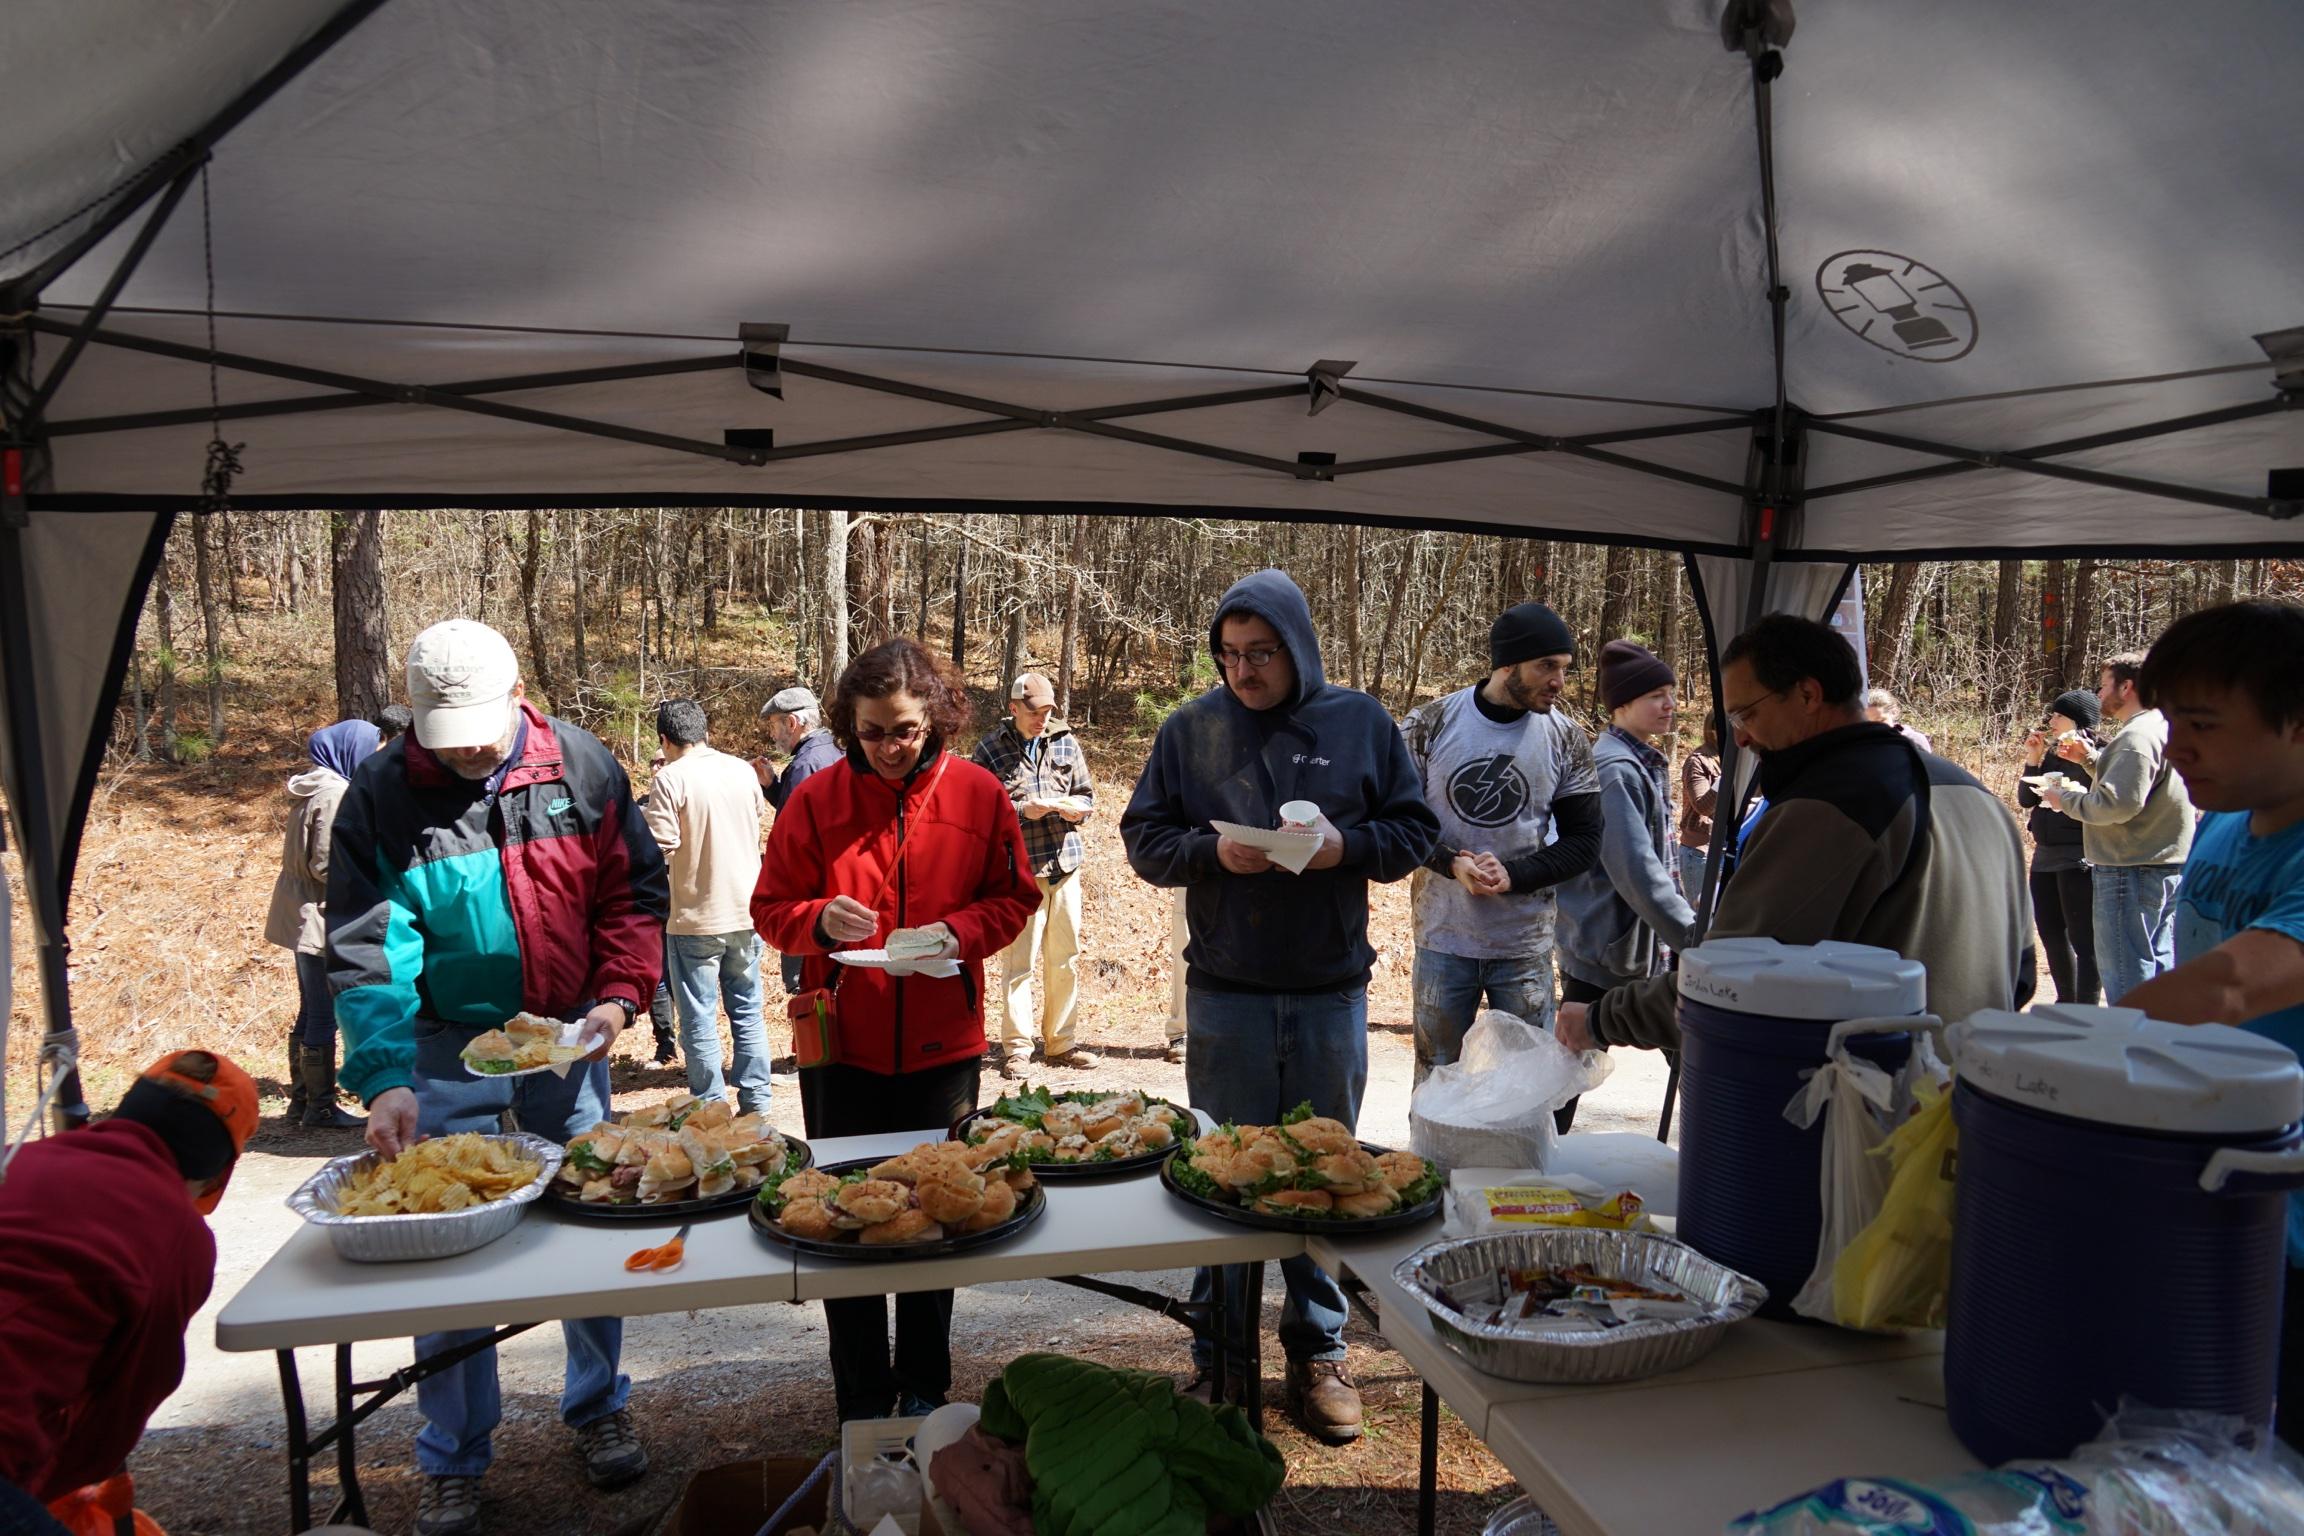 Volunteers luncheon after event